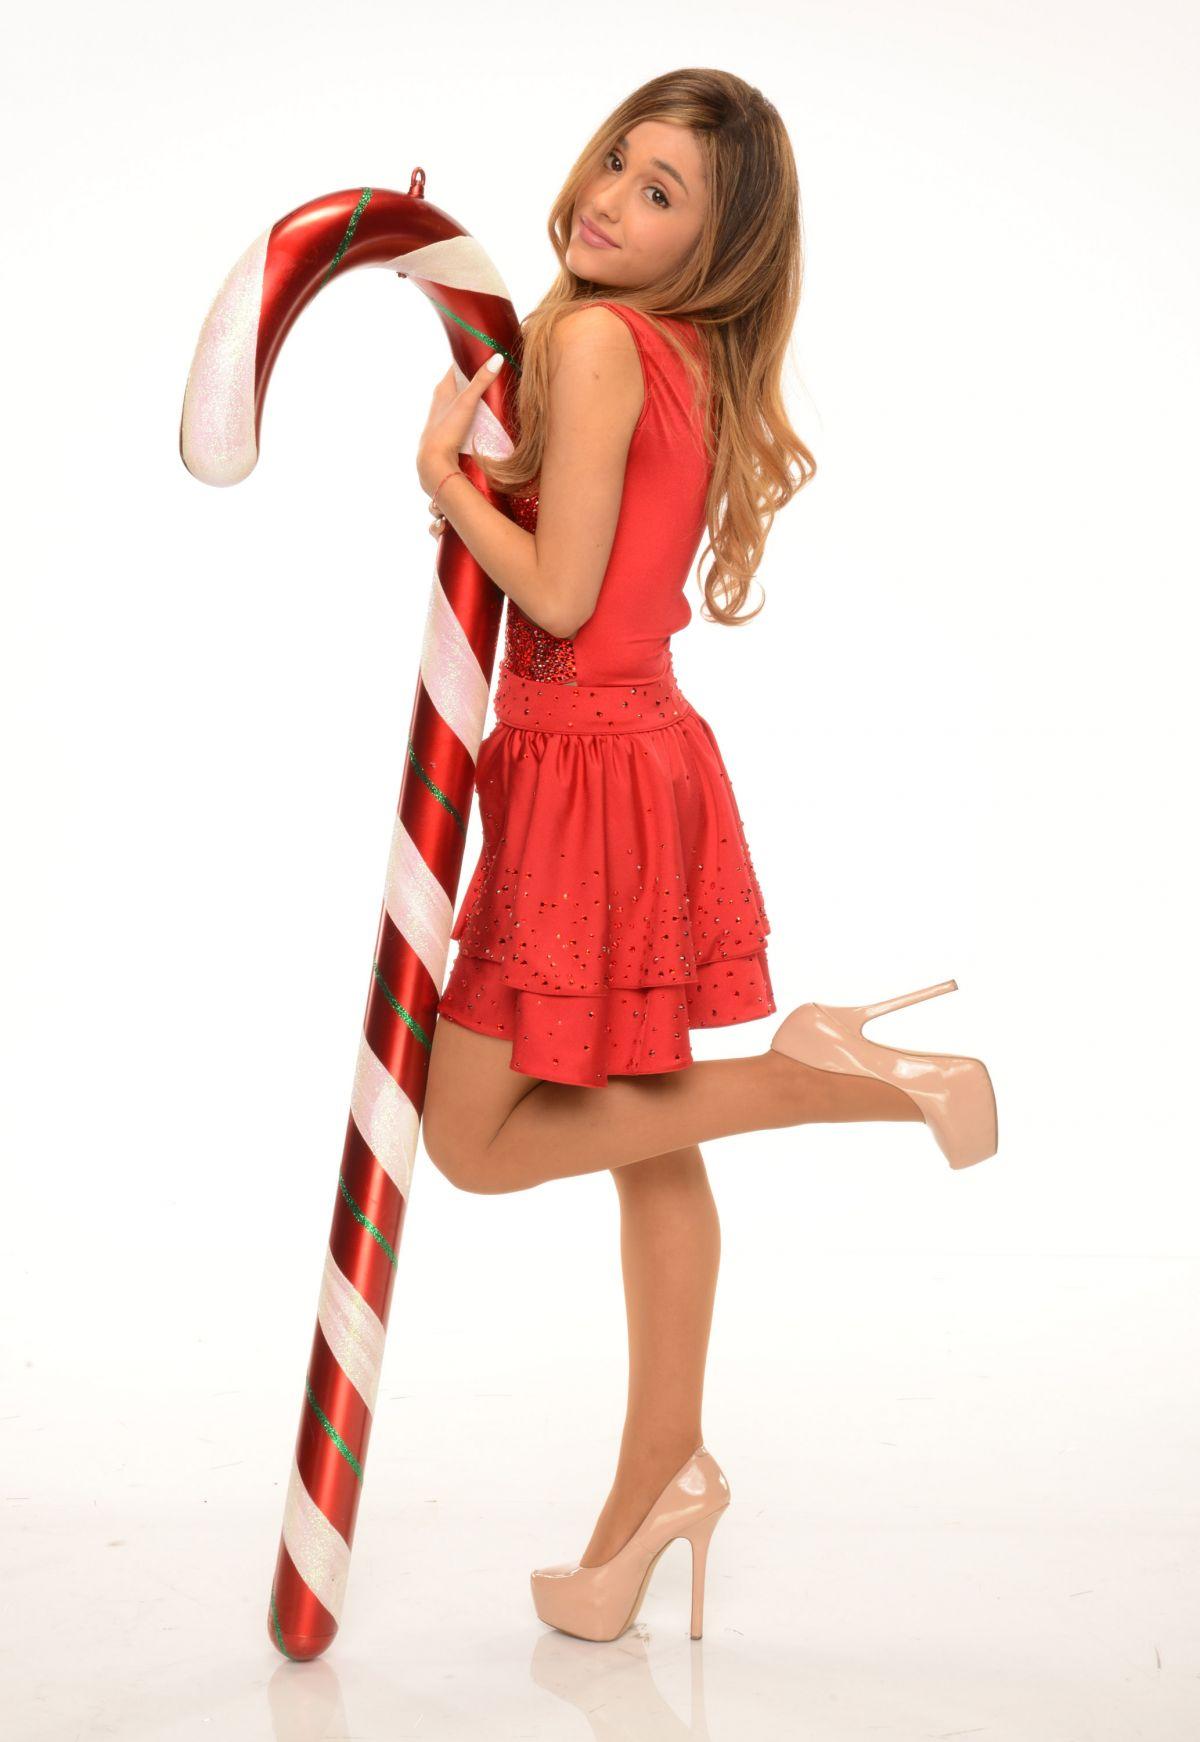 Ariana Grande Icons Tumblr 2014 Ariana Grande – Christmas 2014